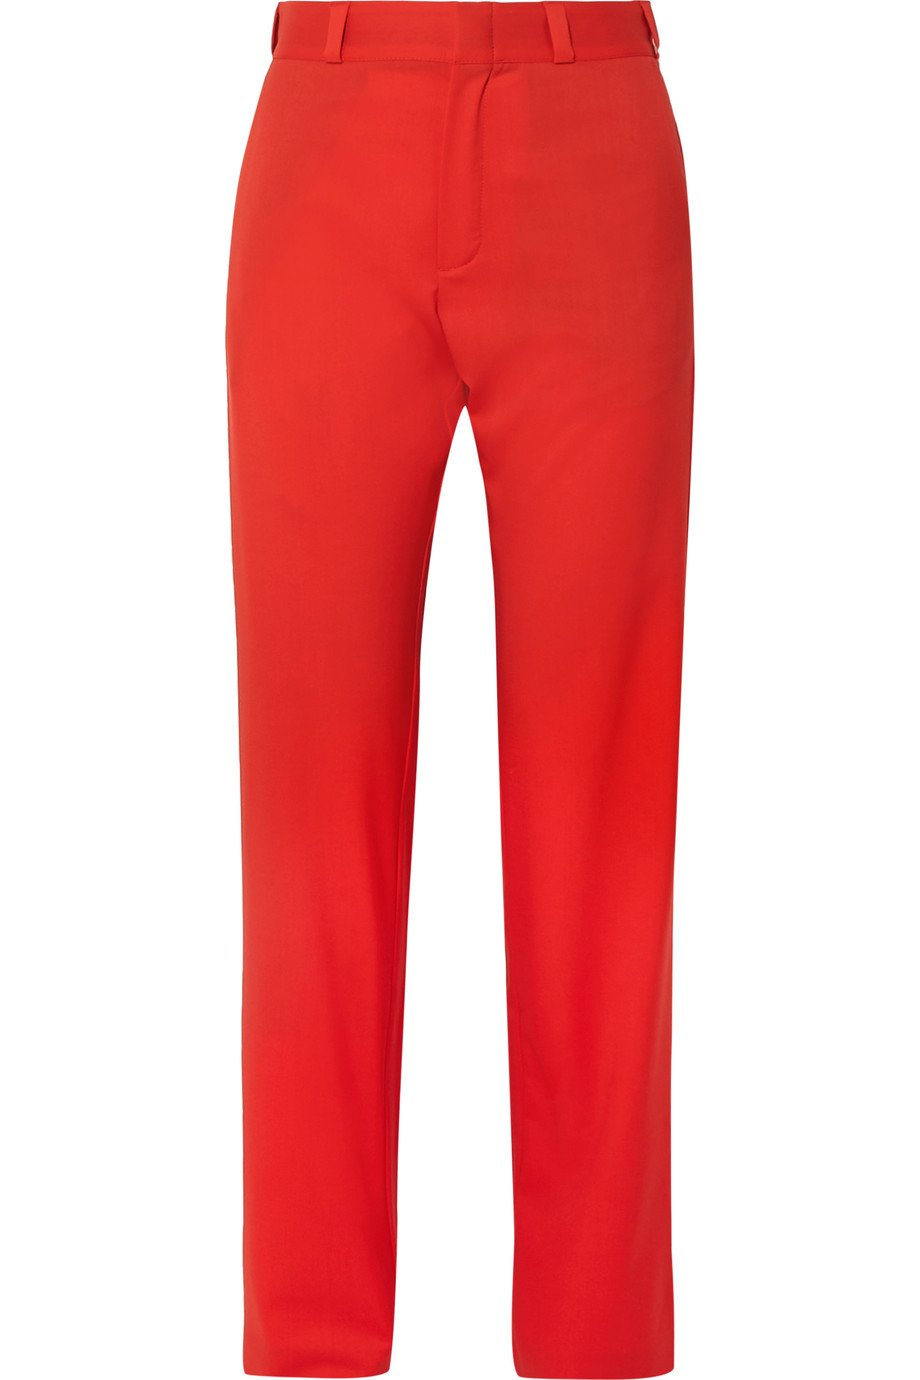 Vetements | Wool straight-leg pants | NET-A-PORTER.COM